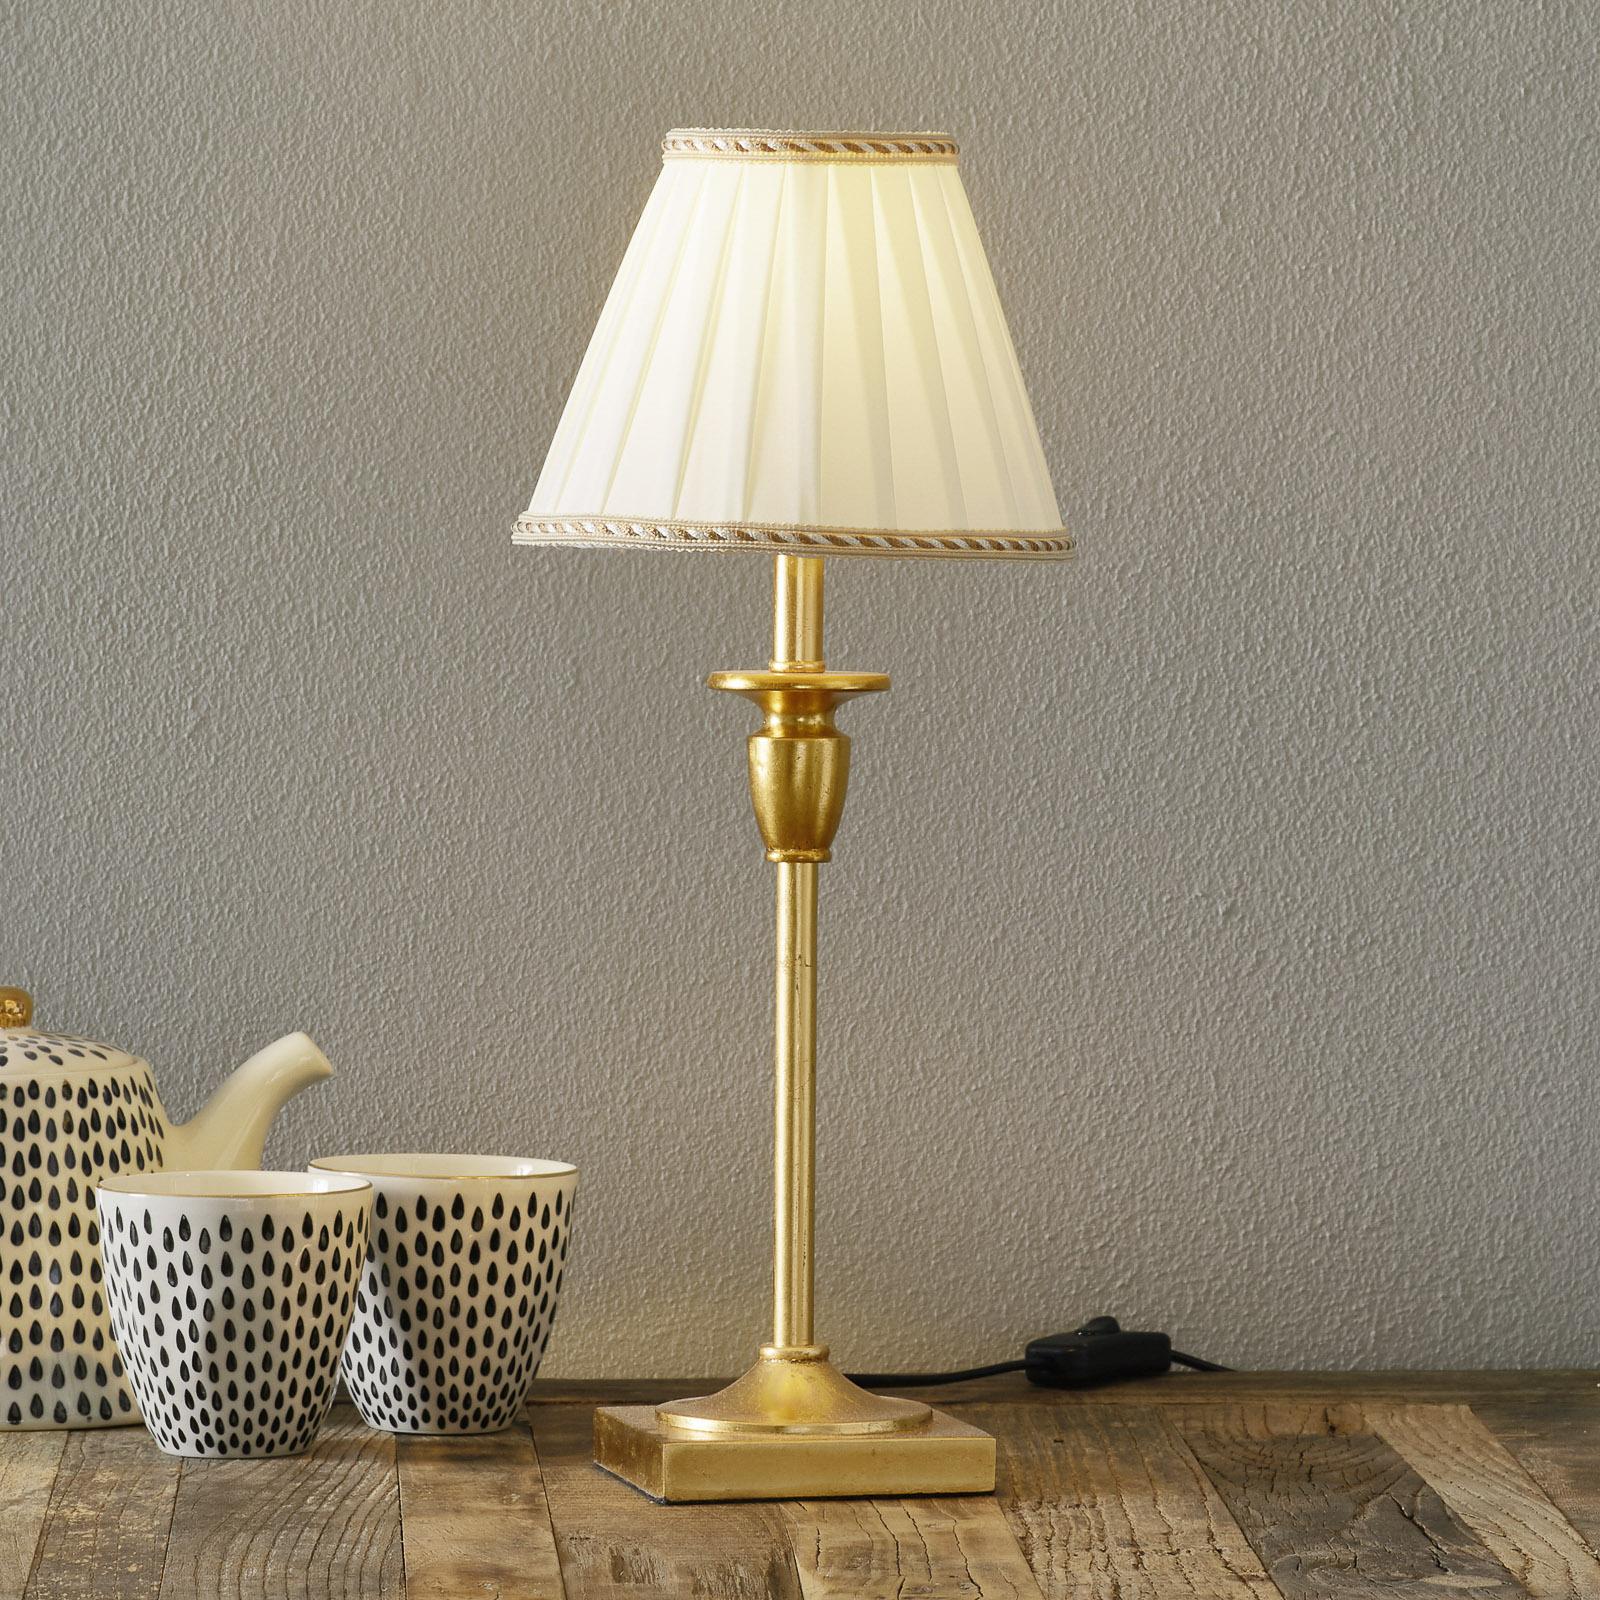 Tyylikäs pöytälamppu DONATA, Ø 17,8 cm